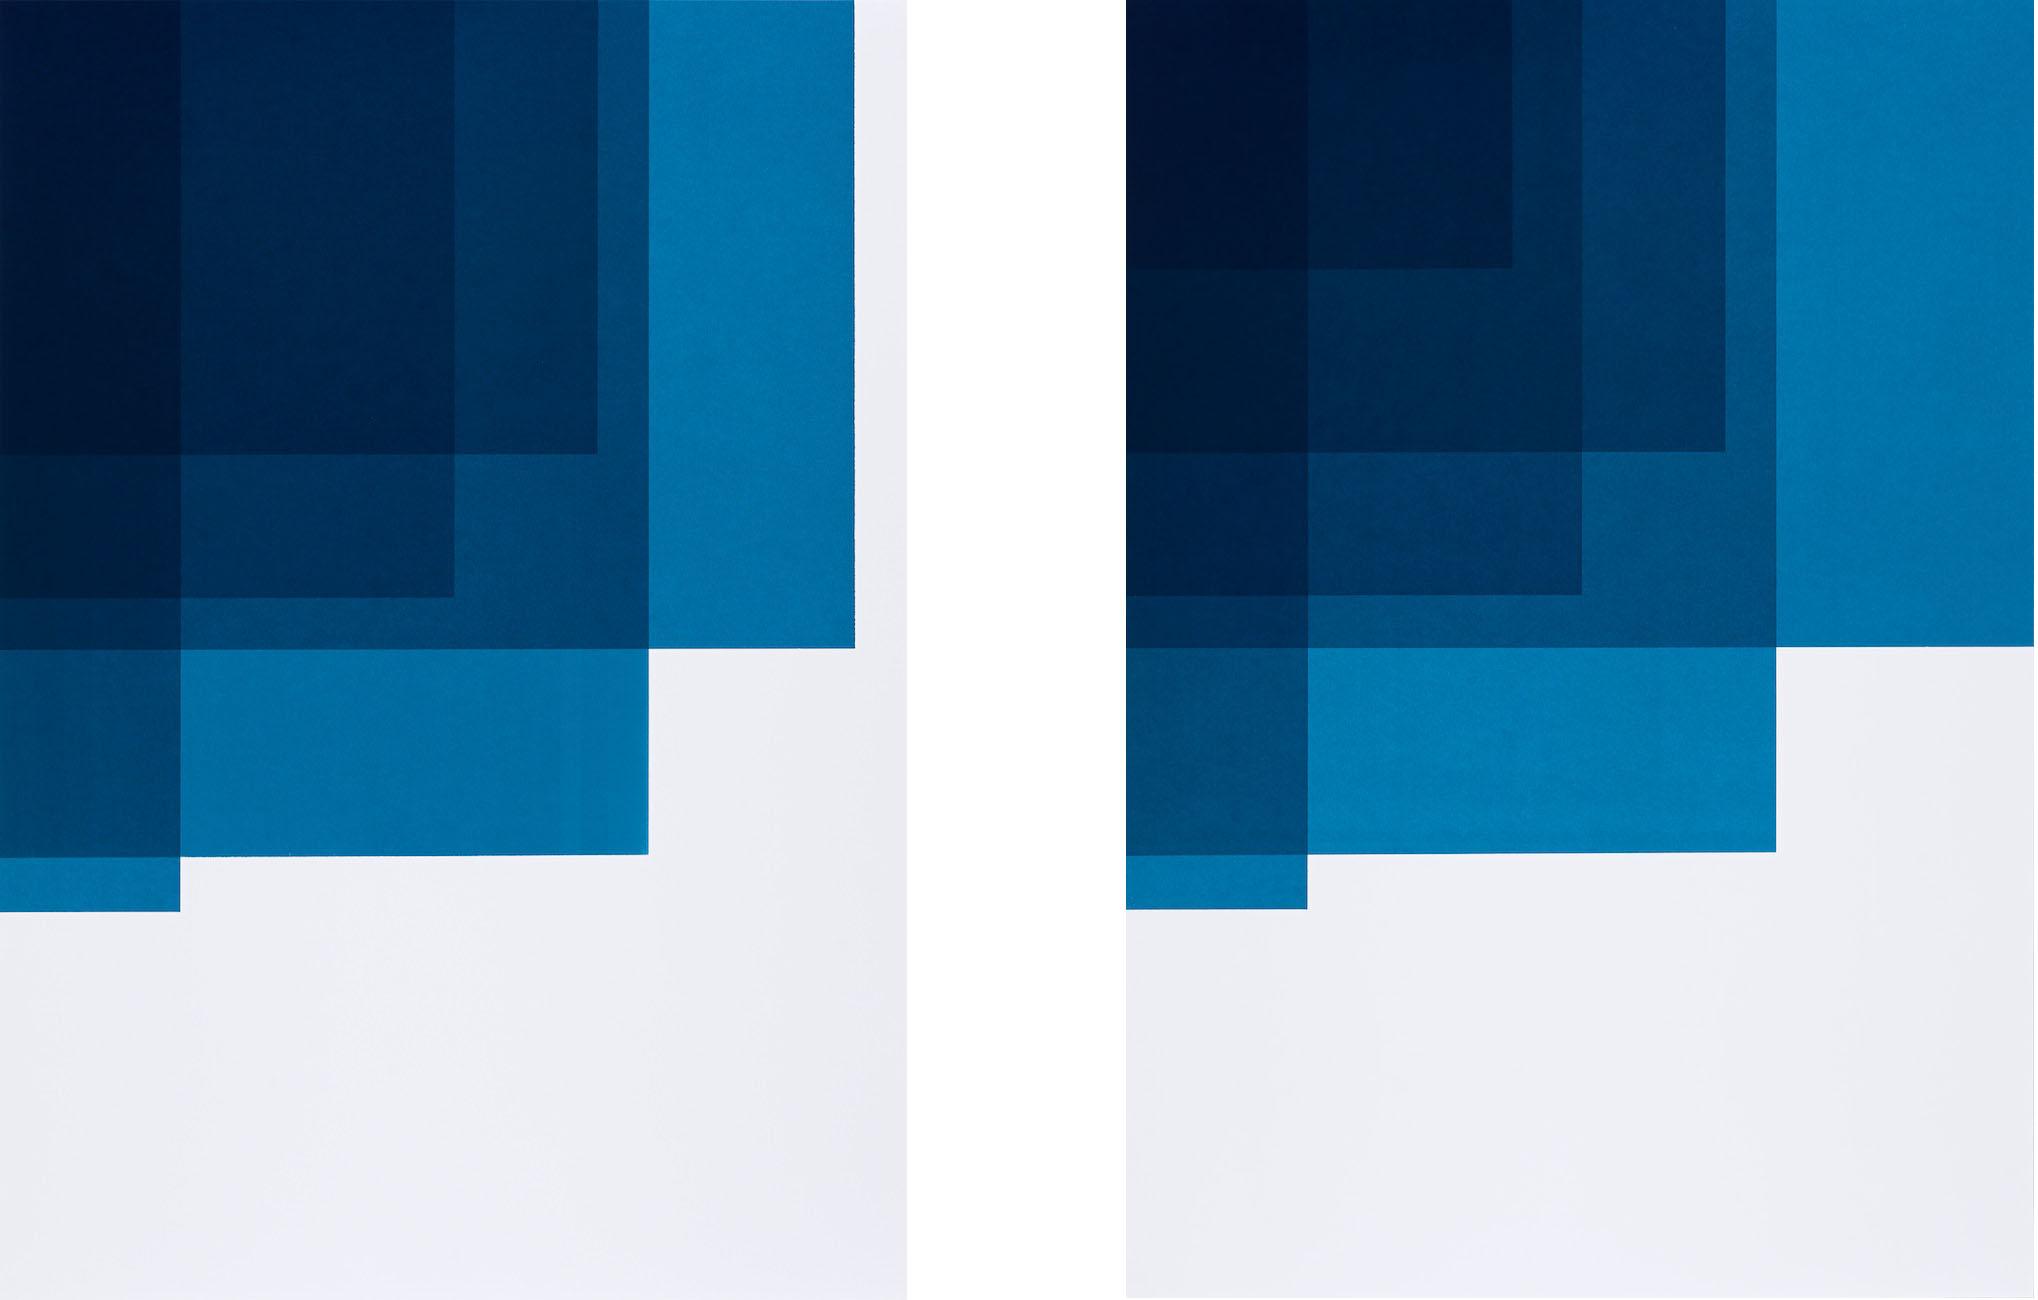 Collecting Colors (Indigo I + II), 2016. Silkscreen print 100 x 70 cm. Ed. 4